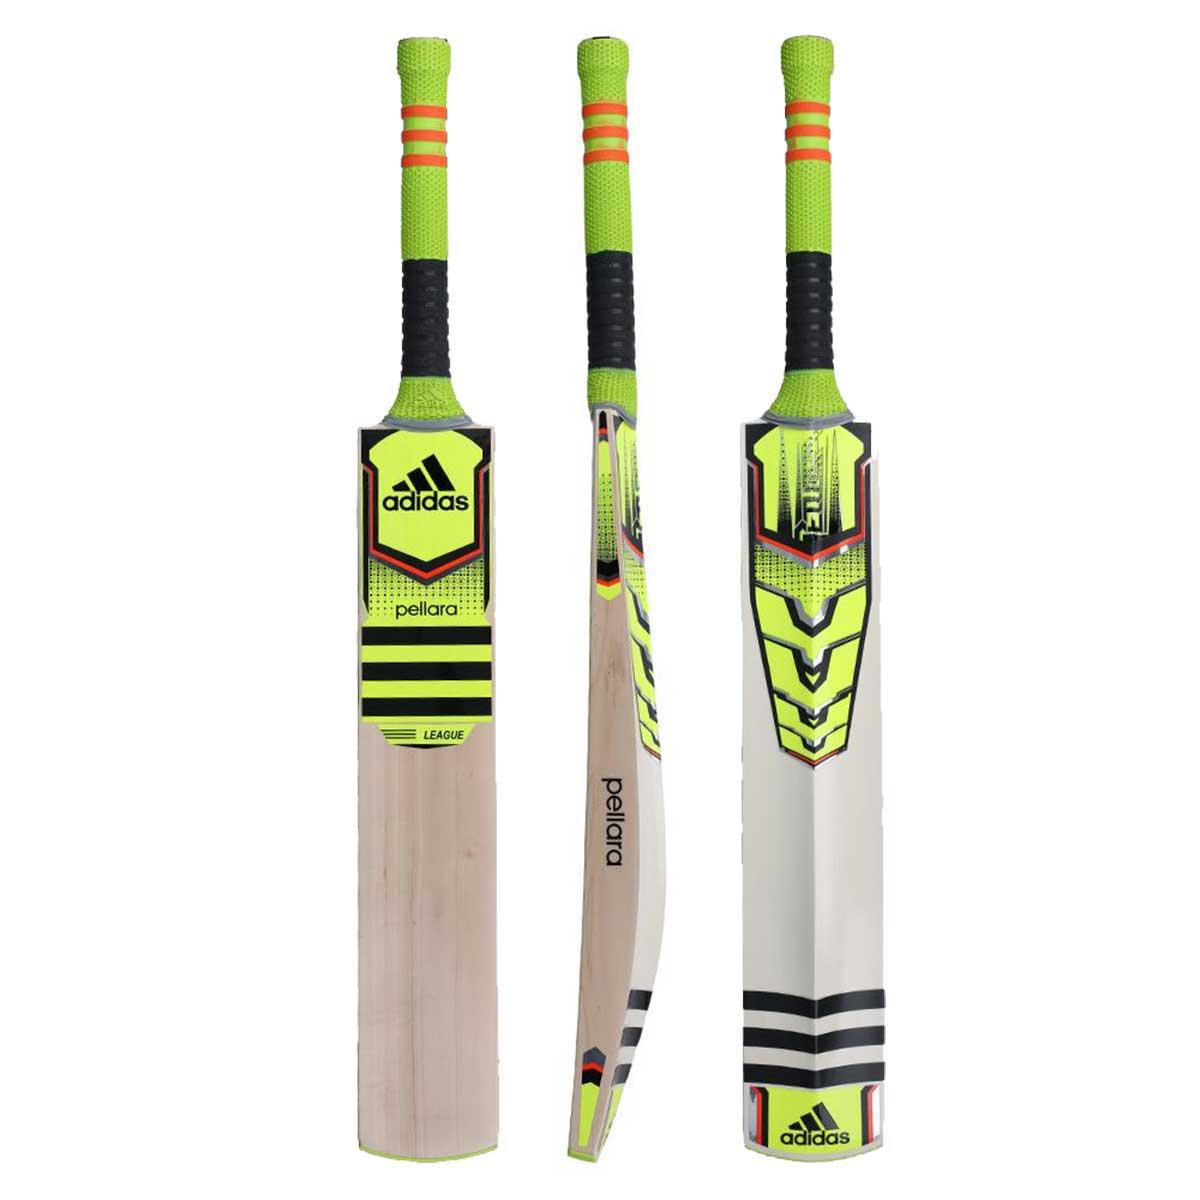 Buy Adidas Pellara League Cricket Bat Online In India